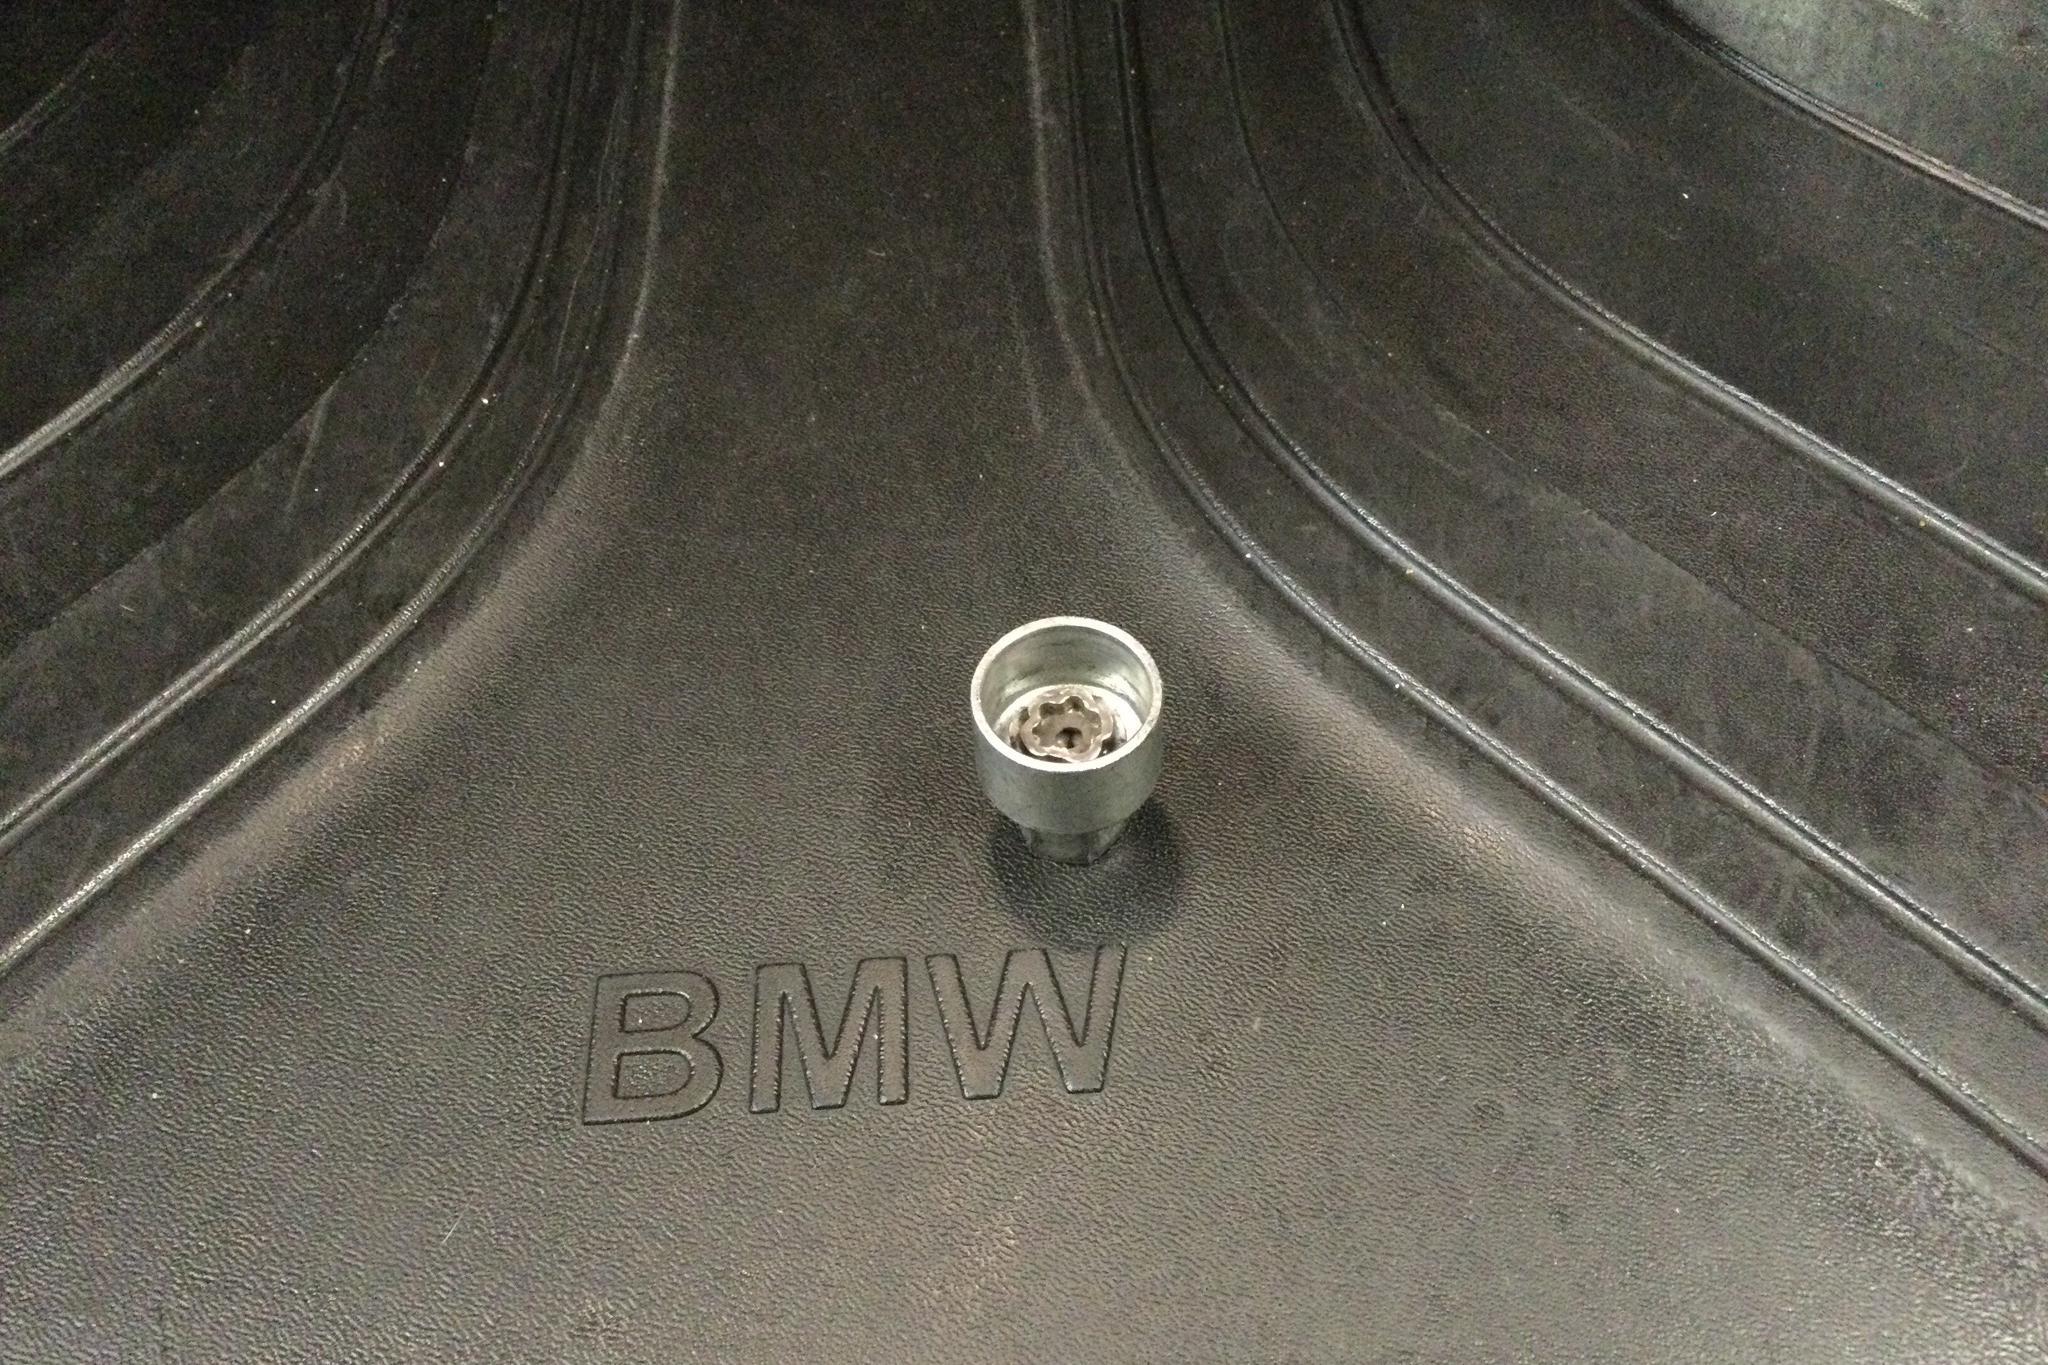 BMW 328i xDrive Sedan, F30 (245hk) - 167 010 km - Automatic - gray - 2013